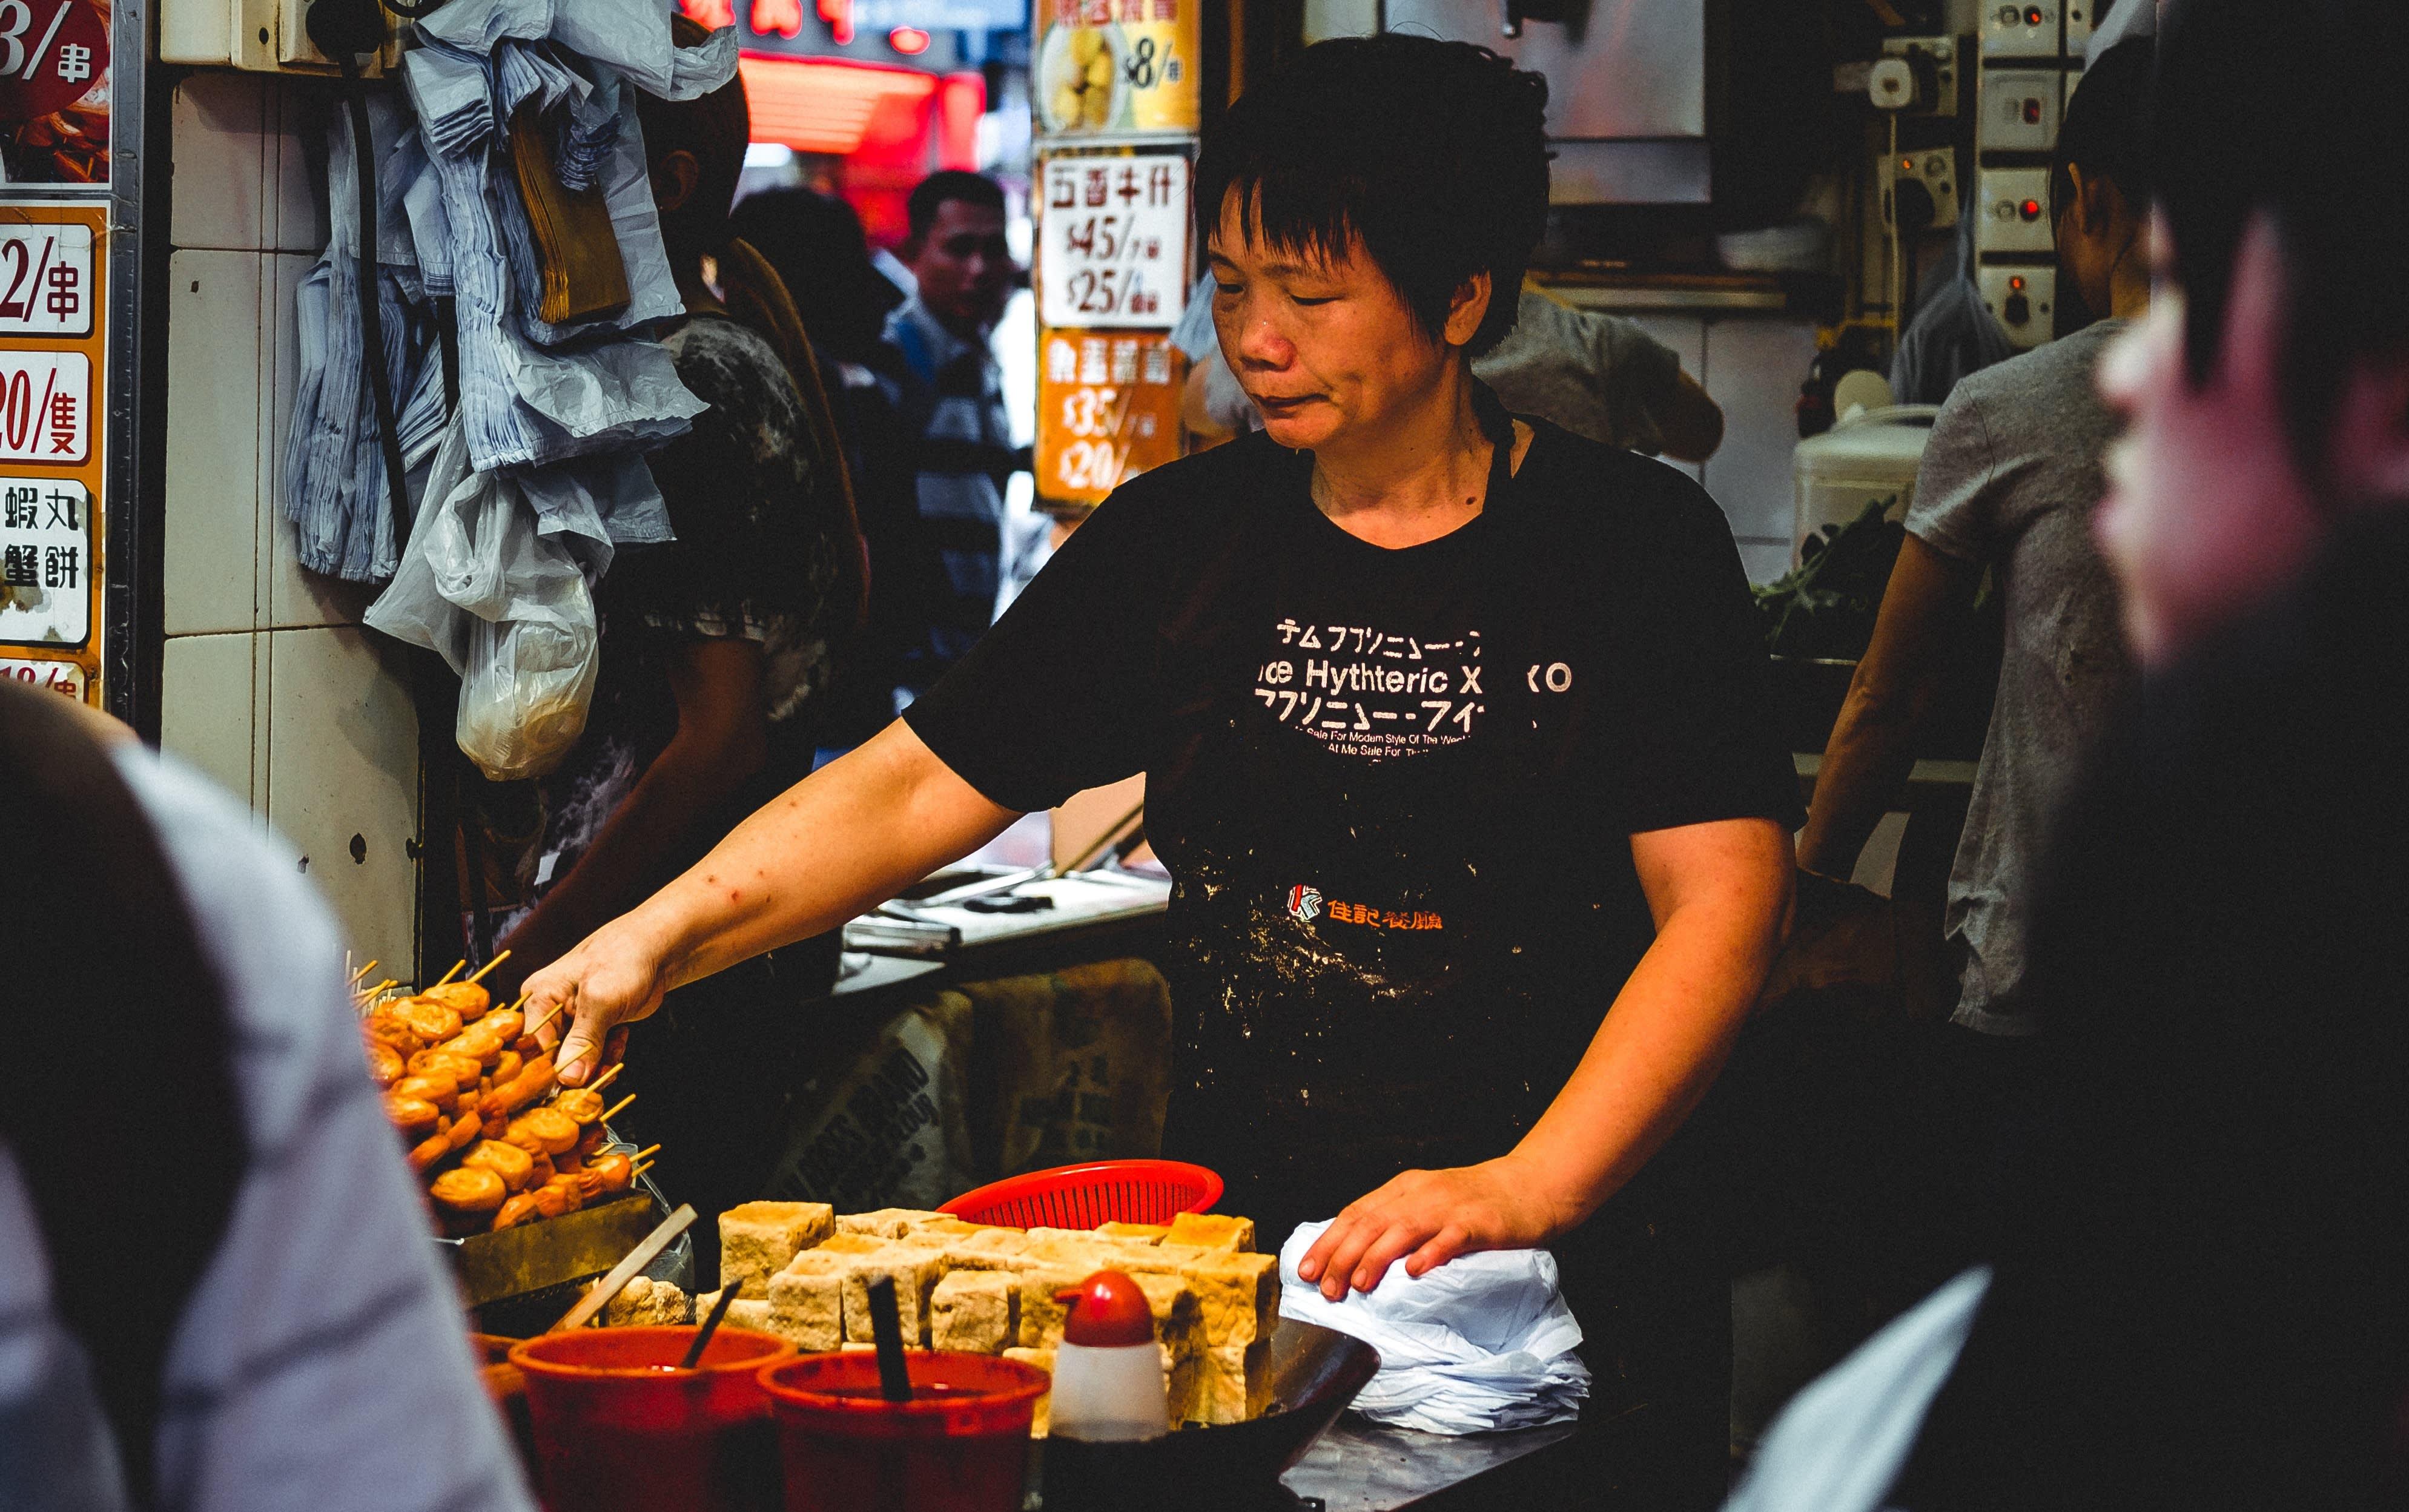 Street food vendor in Hong Kong